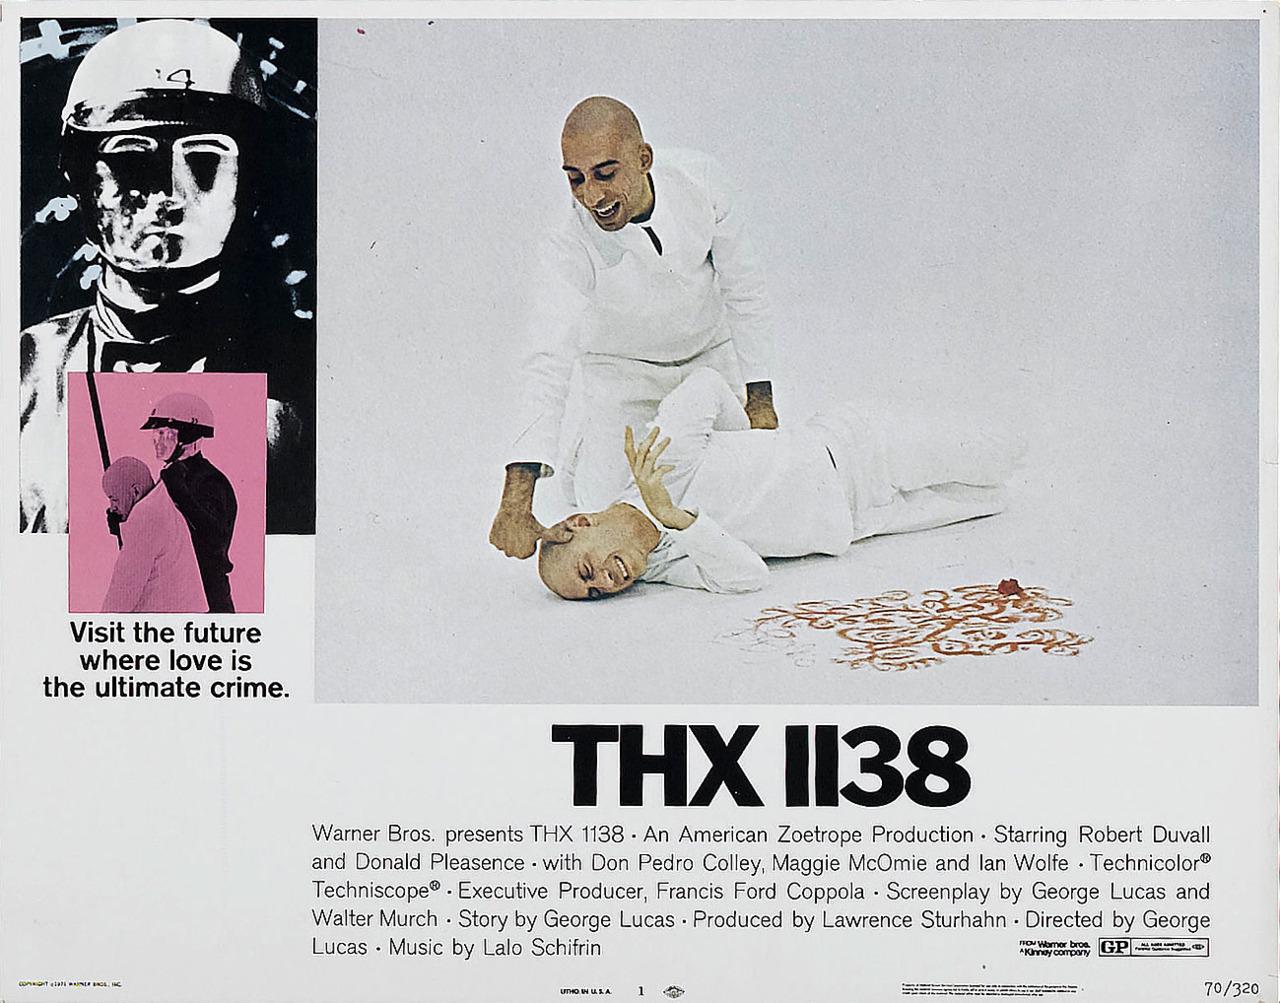 tumblr lvmud5Uhz51qkcj94o1 1280 THX 1138 THX 1138 Photography lobby cards design